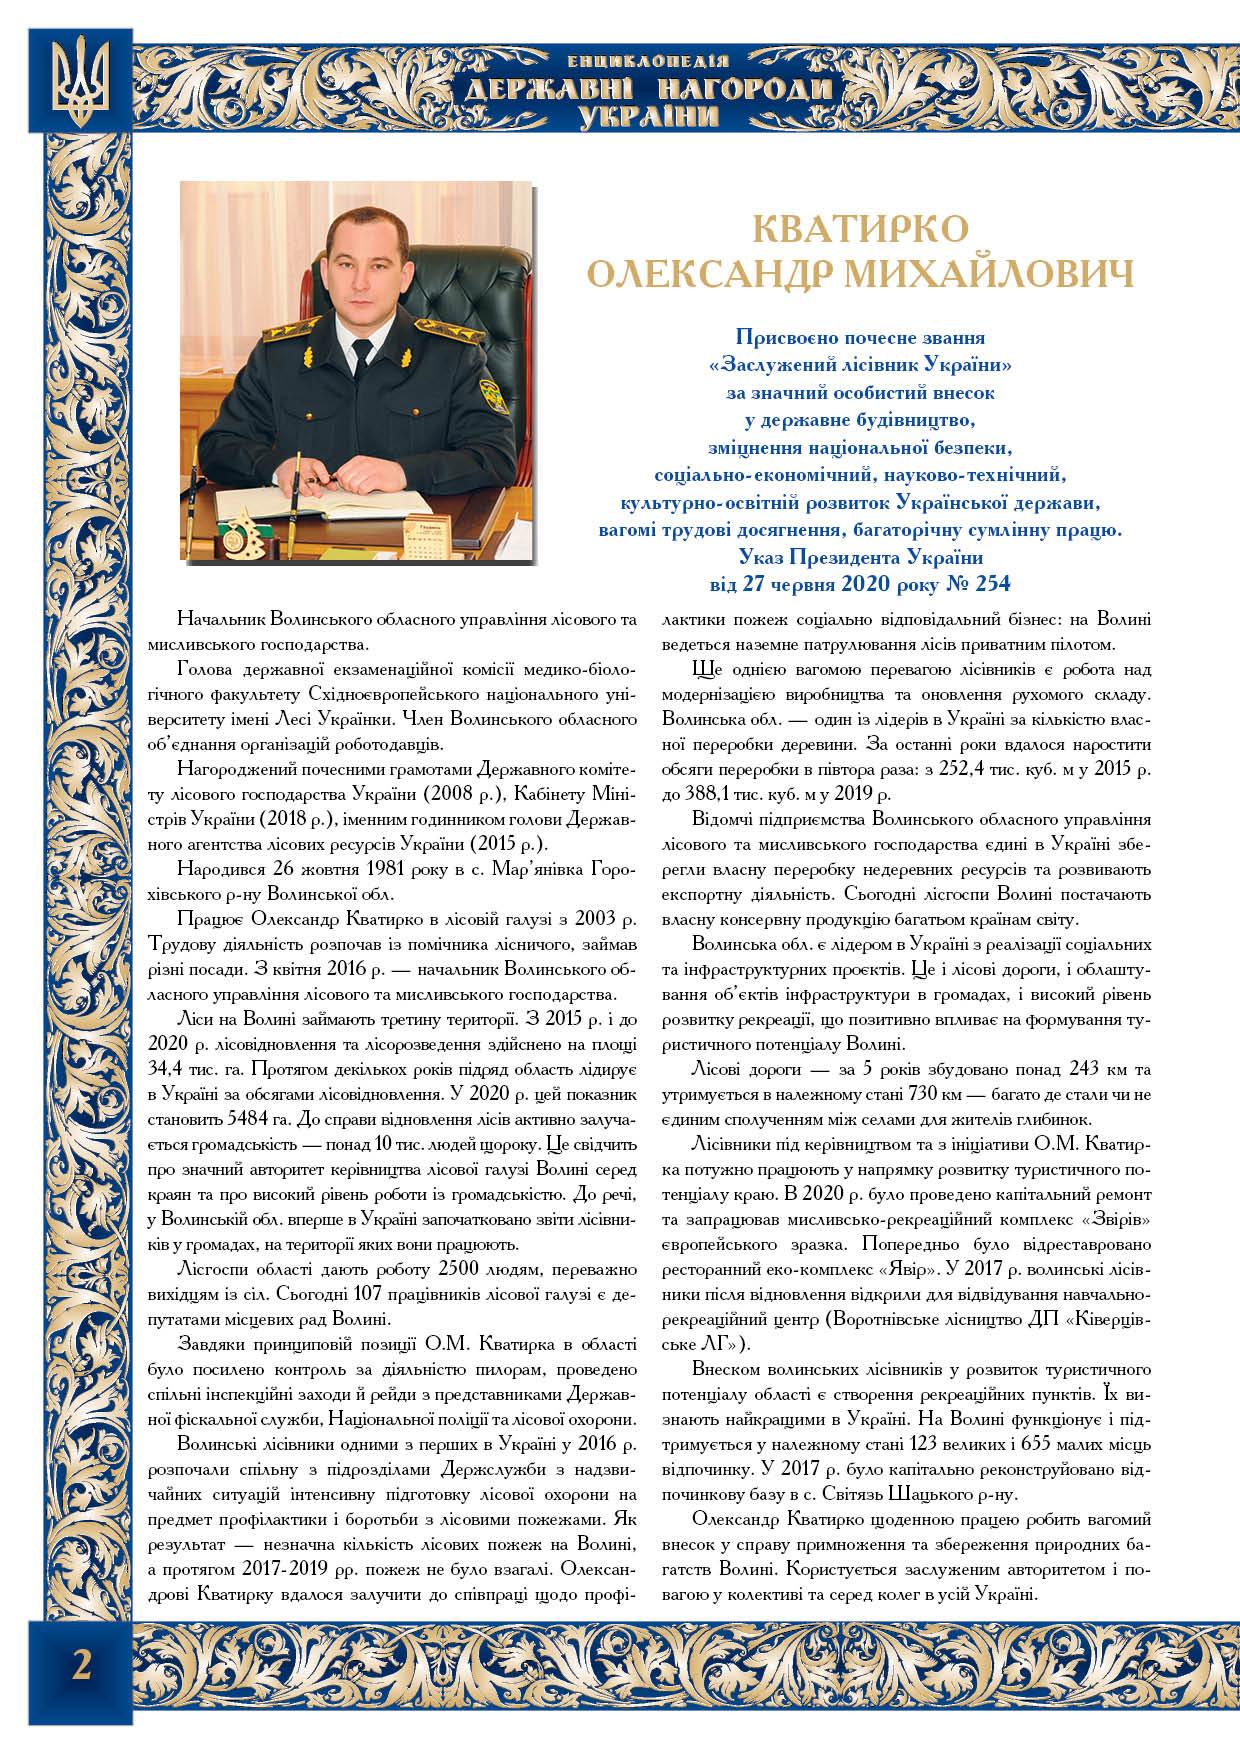 Кватирко Олександр Михайлович